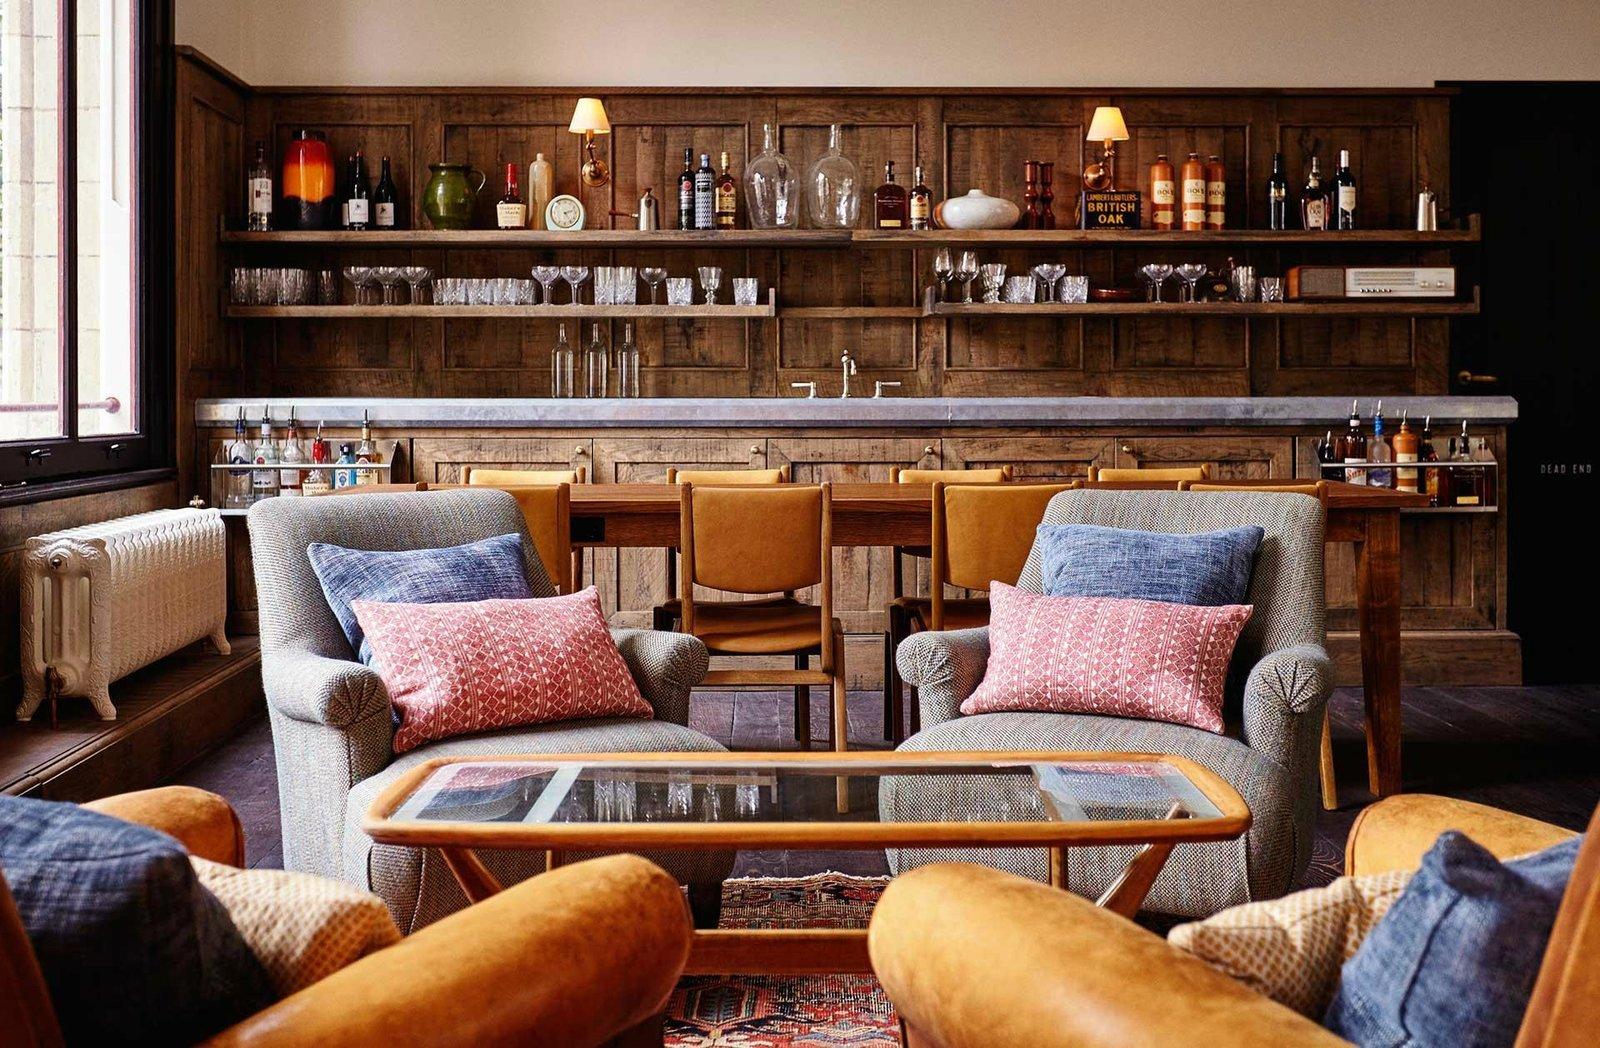 Living Room, Rug Floor, Wall Lighting, Bar, Chair, Dark Hardwood Floor, Table, and Coffee Tables  The Hoxton Amsterdam